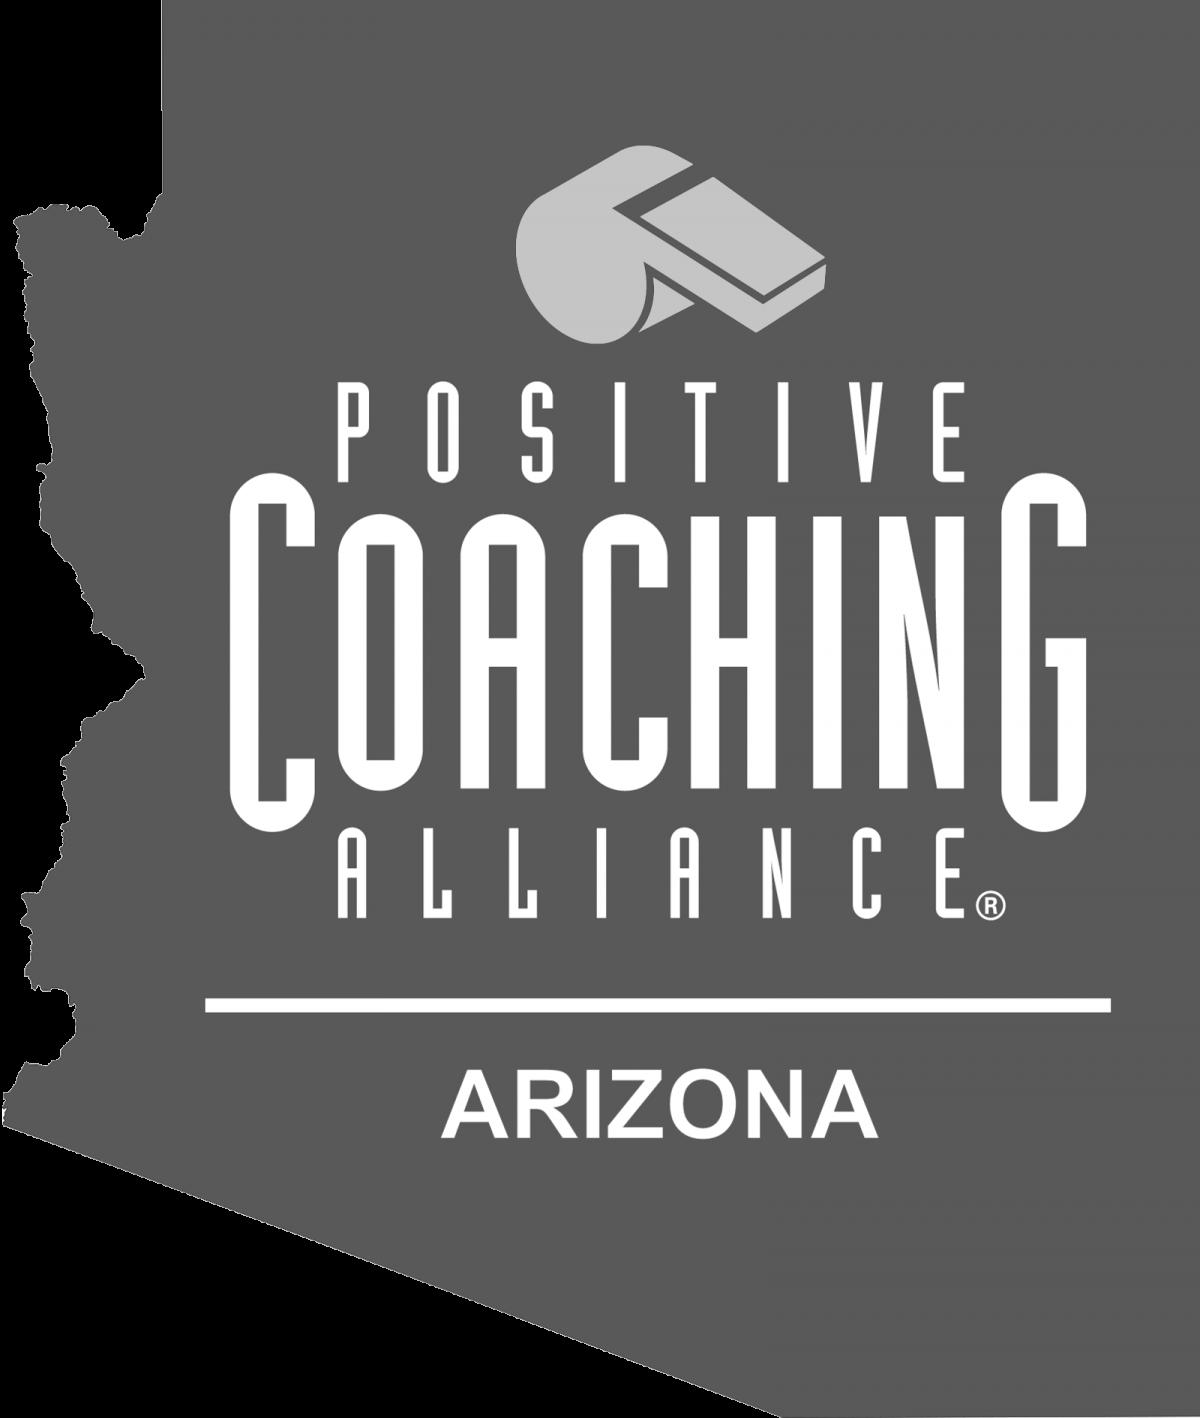 Positive Coaching Alliance Arizona Logo Grayscale